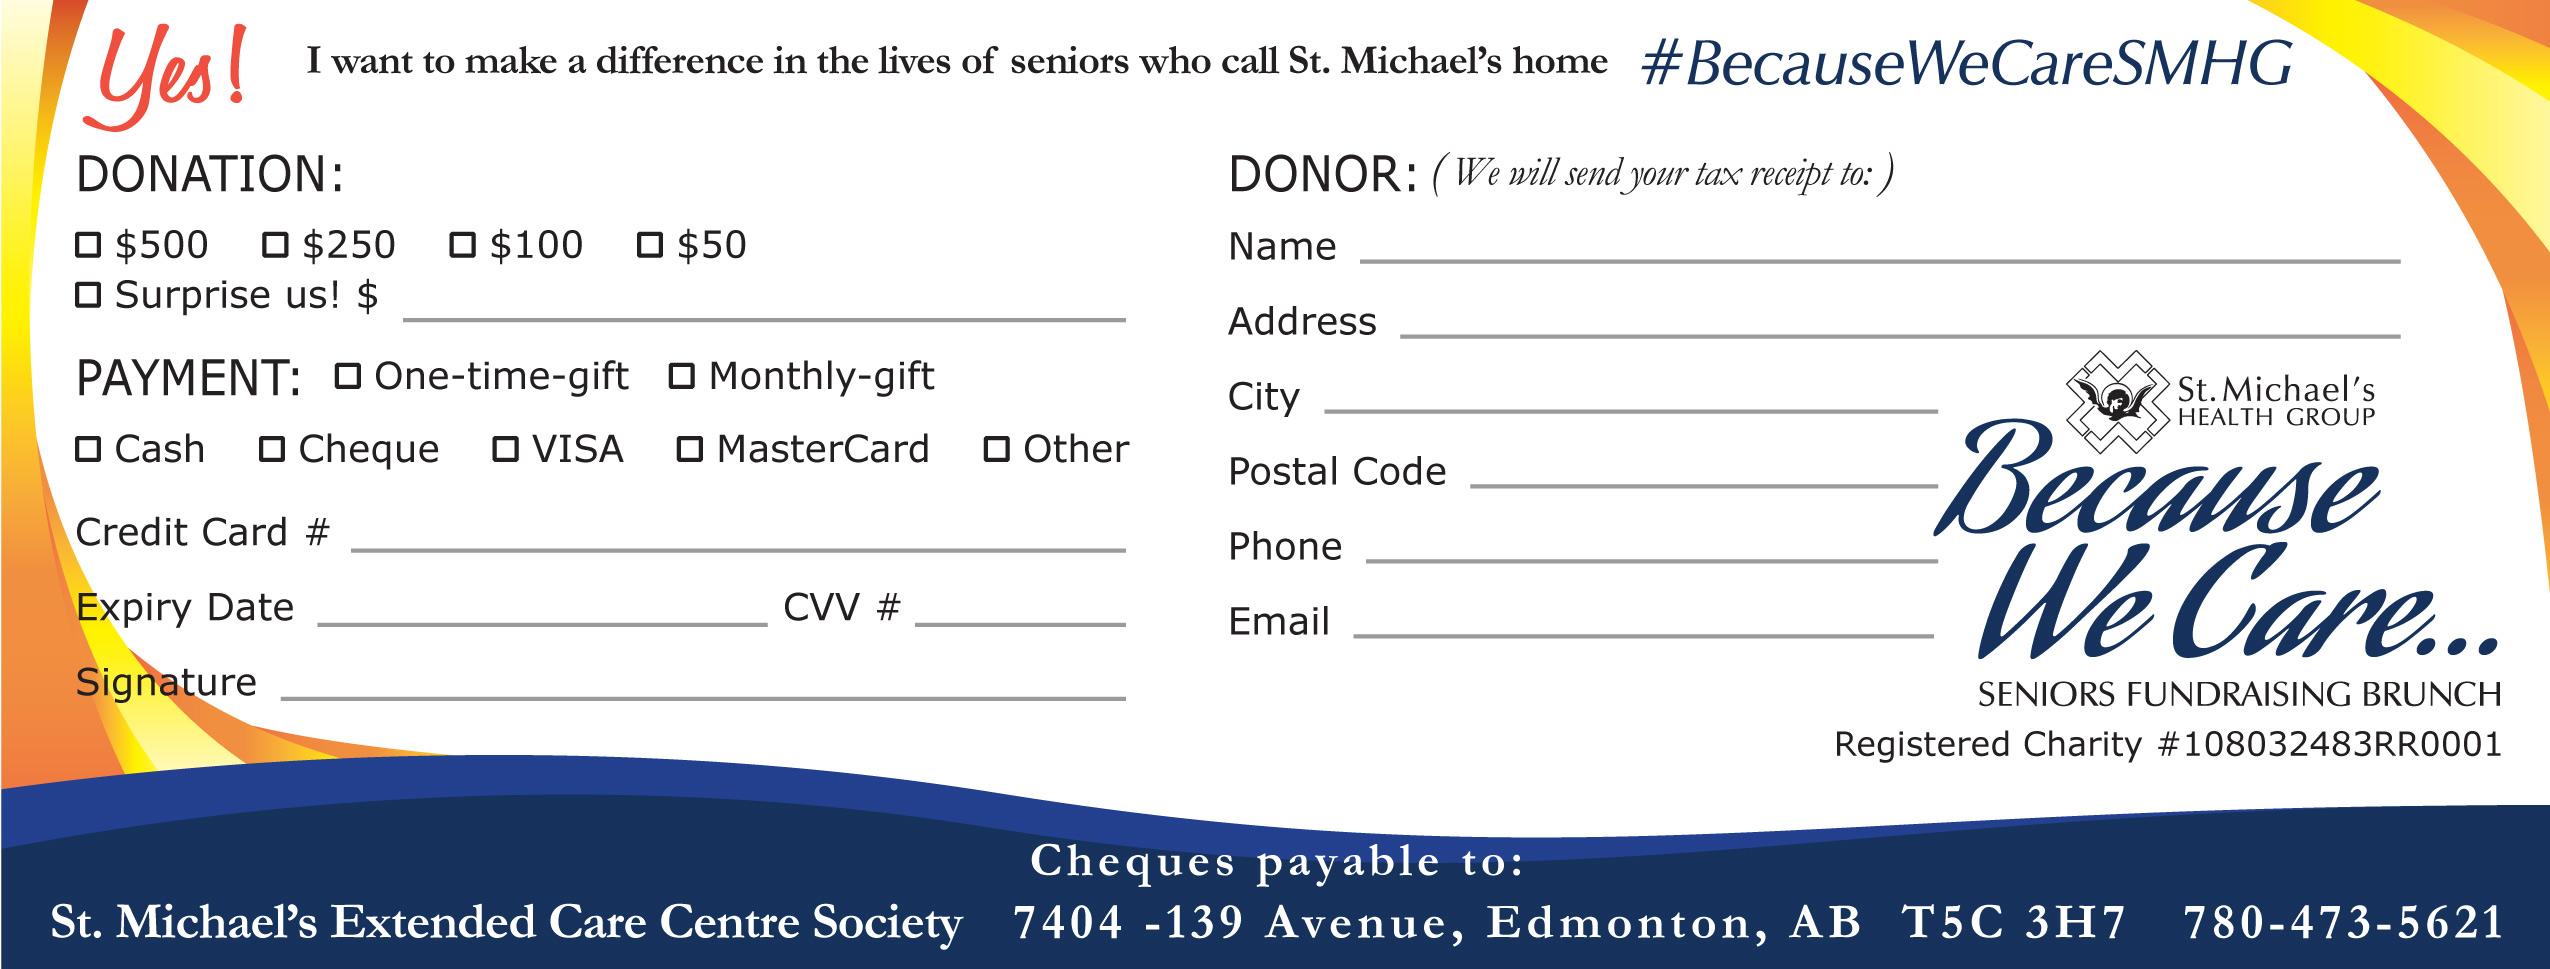 Donation-Forms-2019-WebDonate1